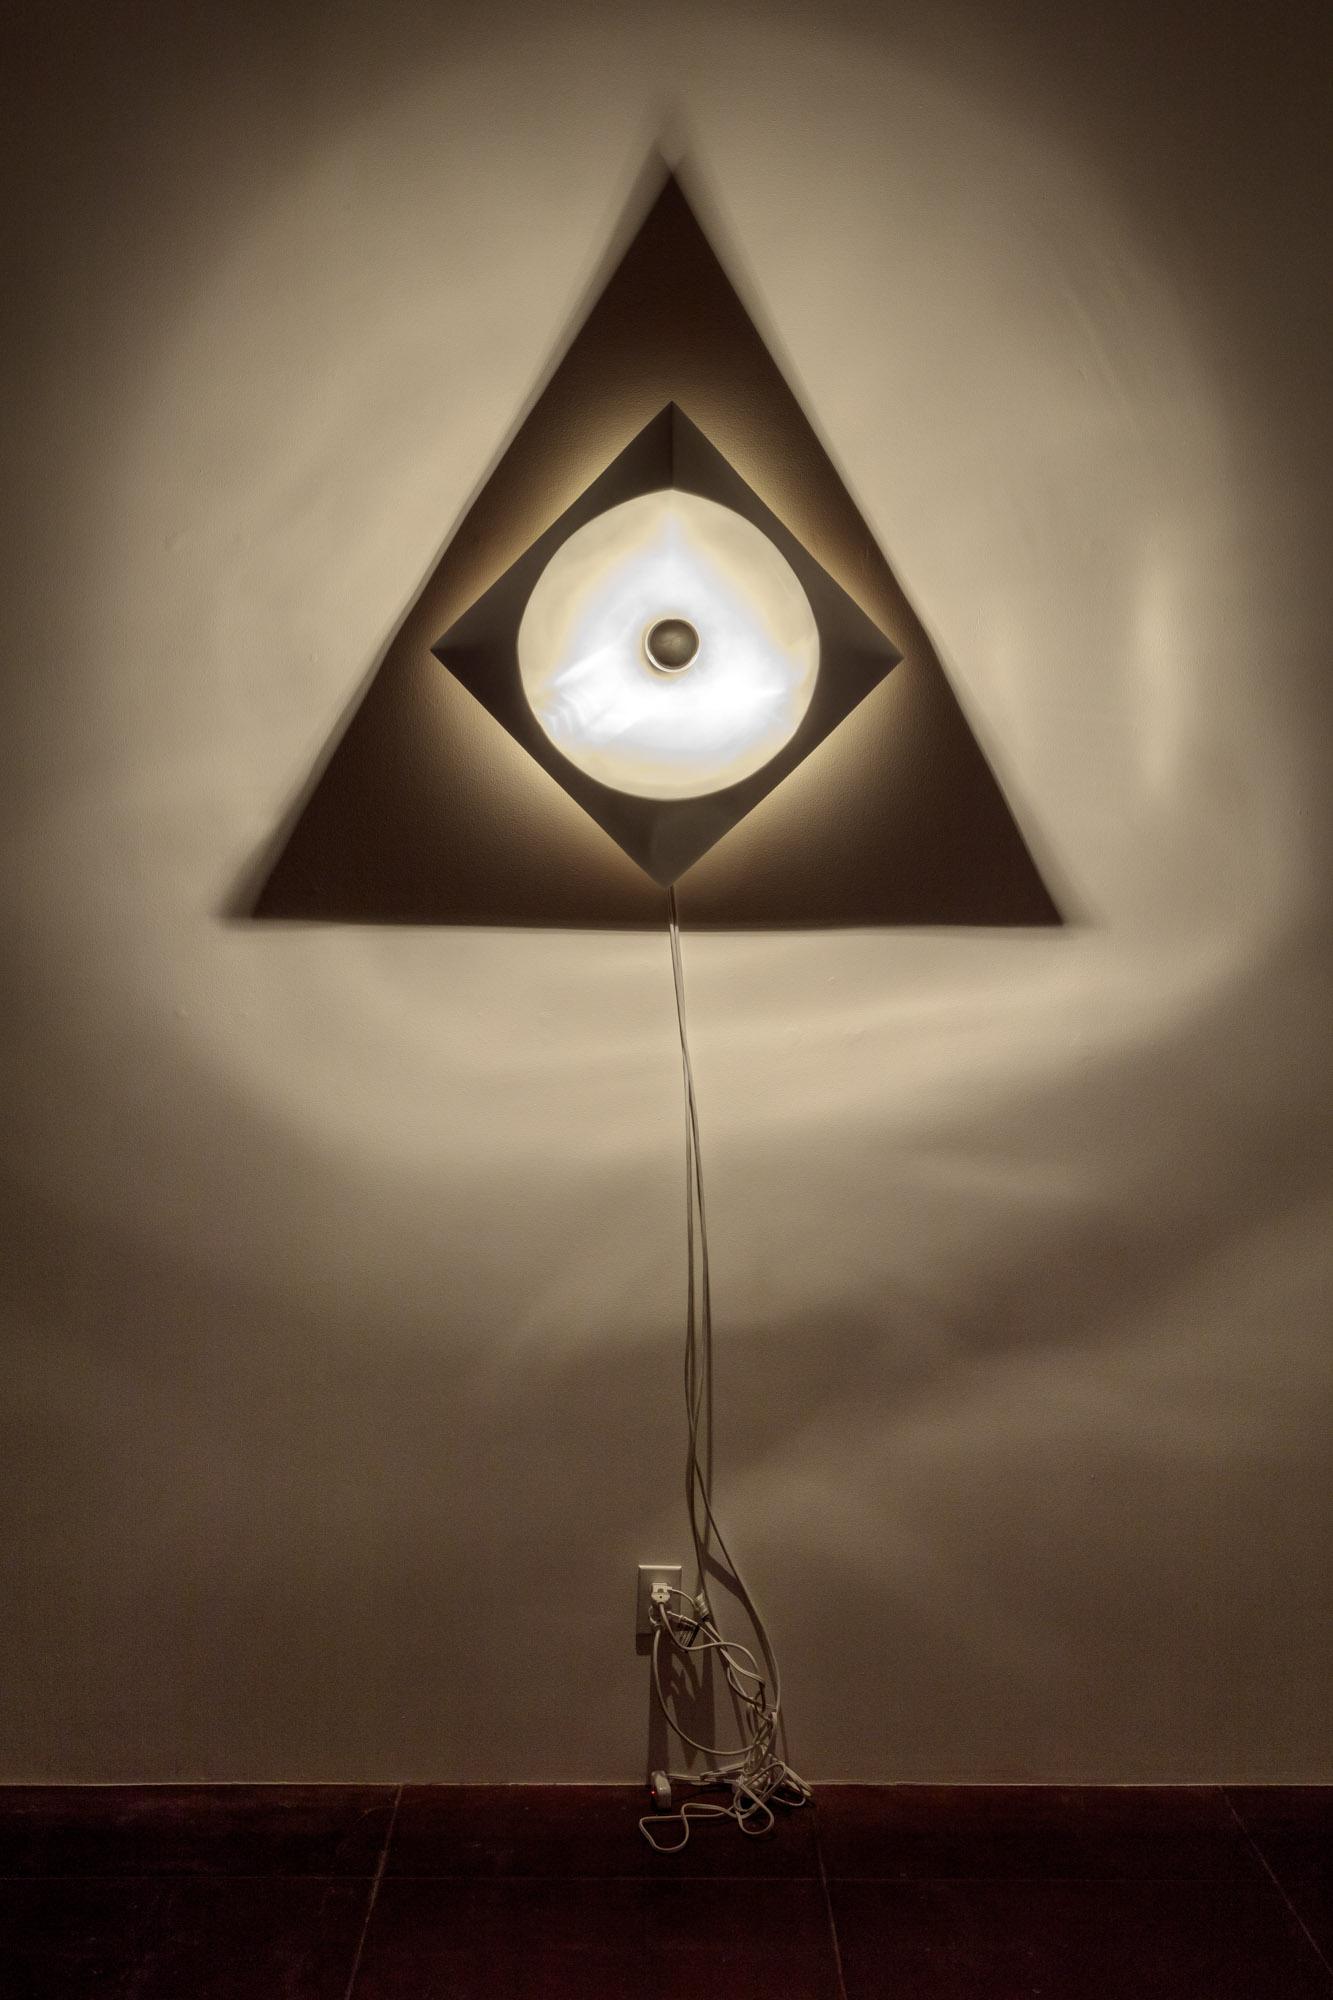 "Circle SquareTriangle:Object Size: 30"" x 30"" / Shadow Size: 54""x 47"""